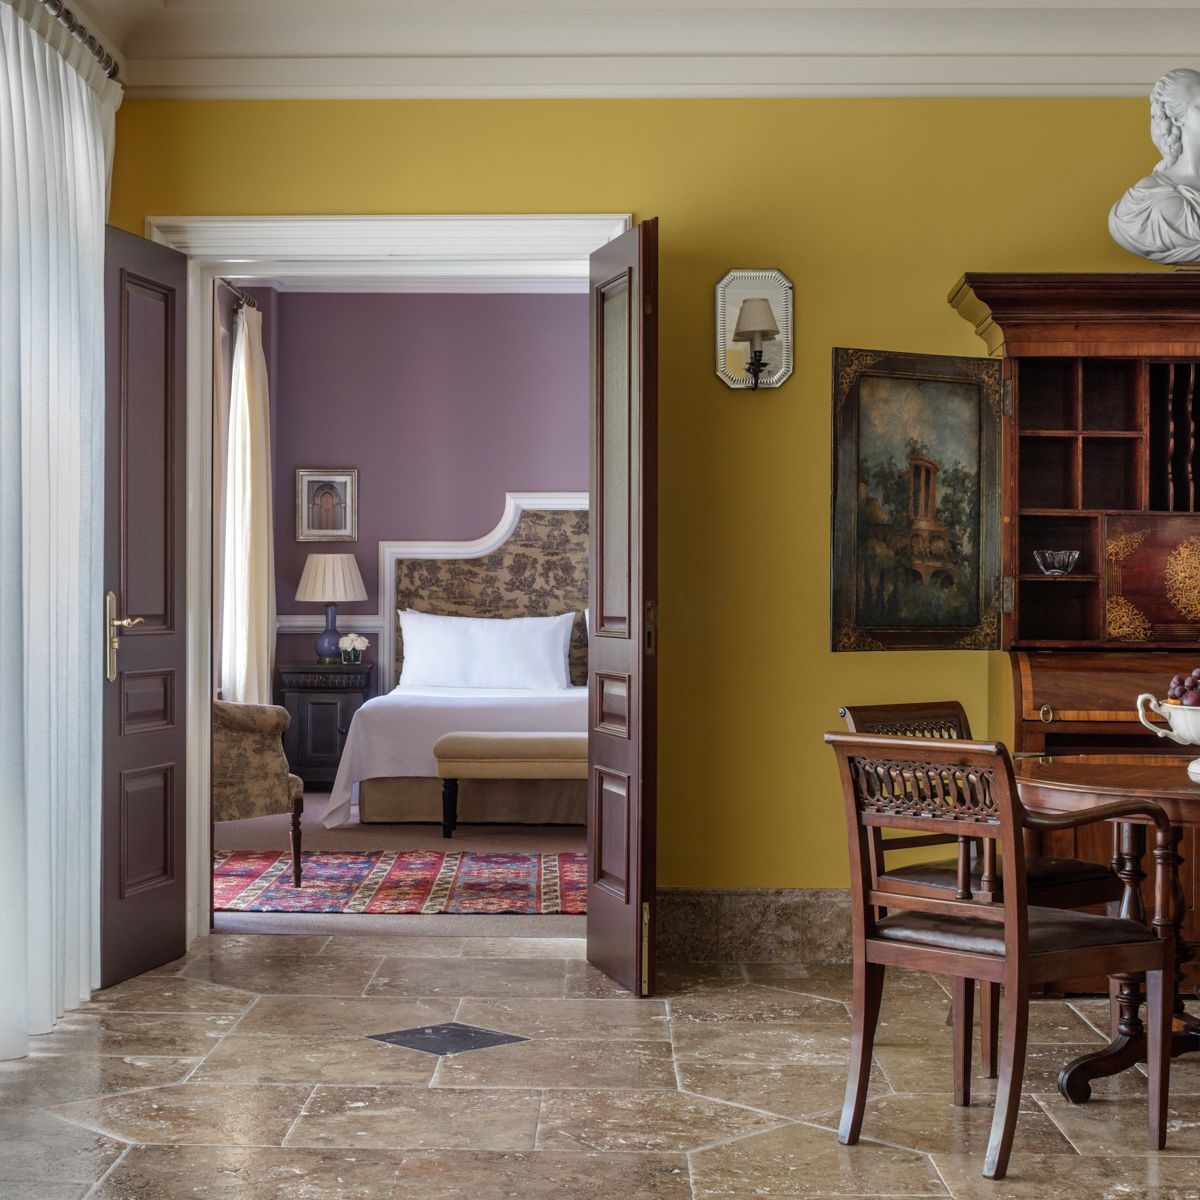 Anantara Luxus Hotel in Marbella-12